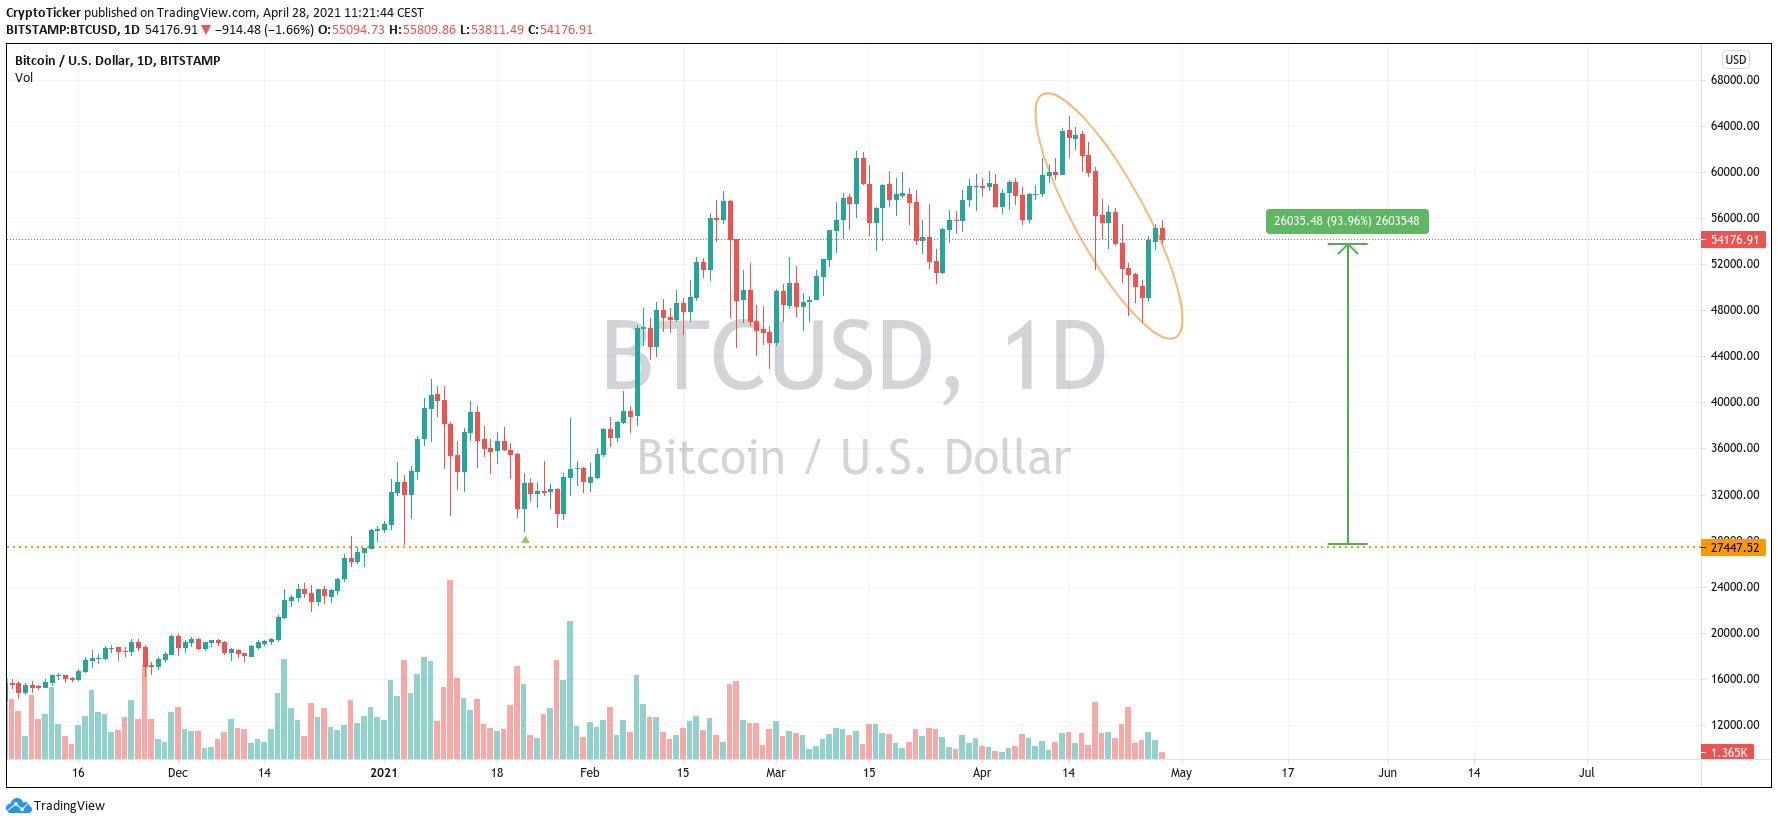 BTC/USD 1-day chart showing BTC's performance YTD